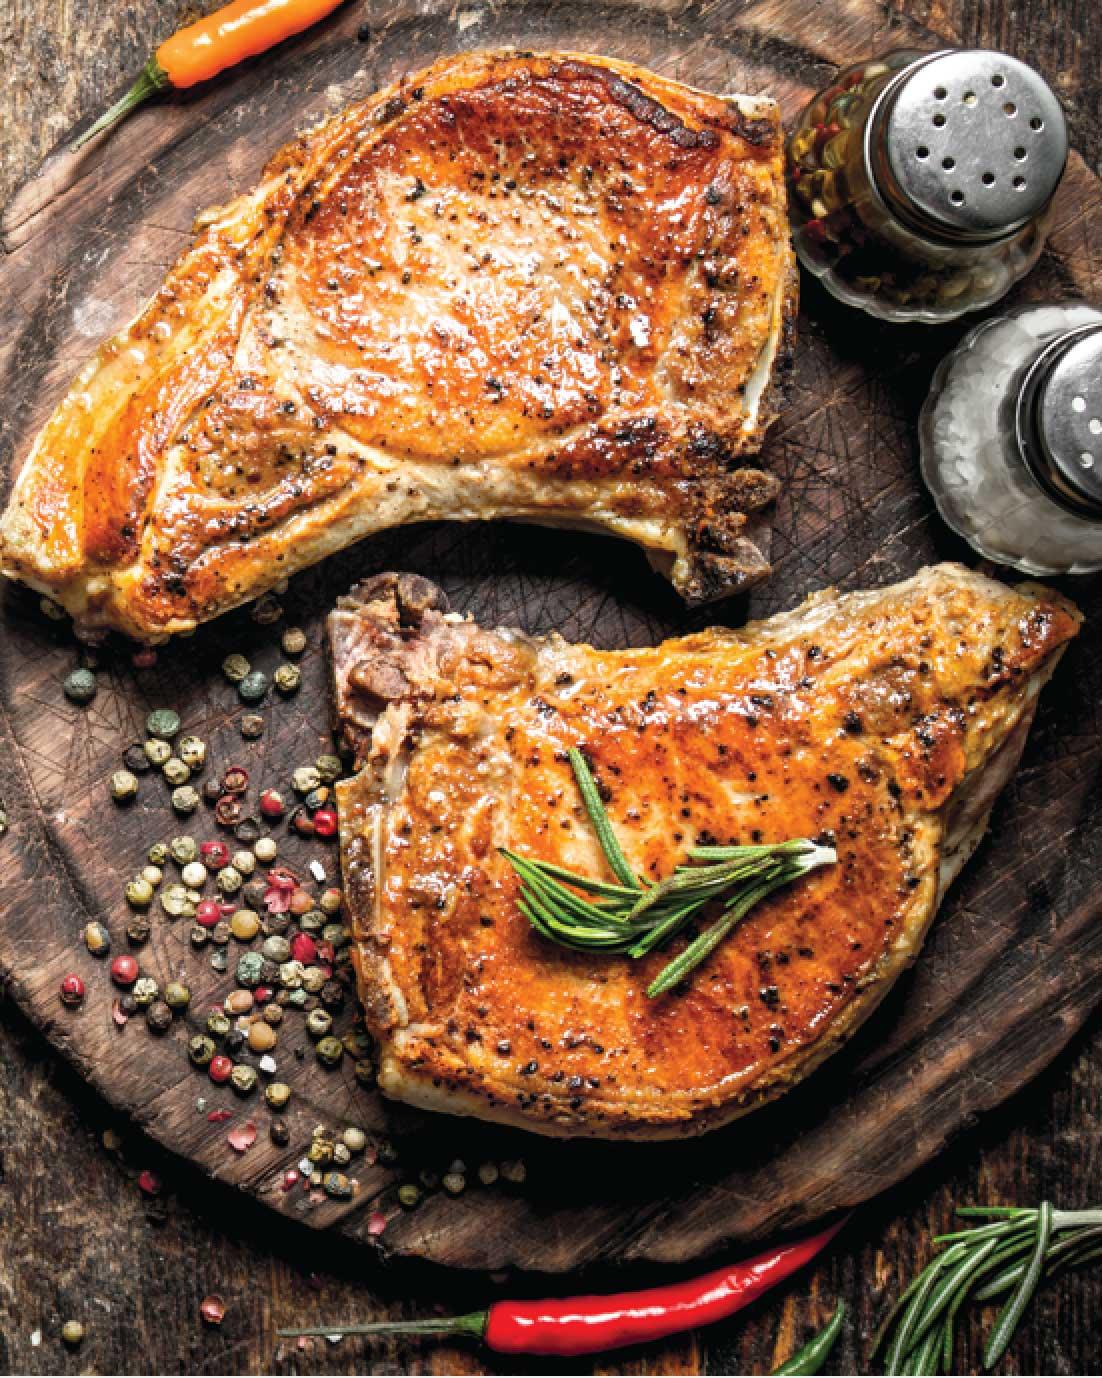 Salt and Pepper Pork Chops